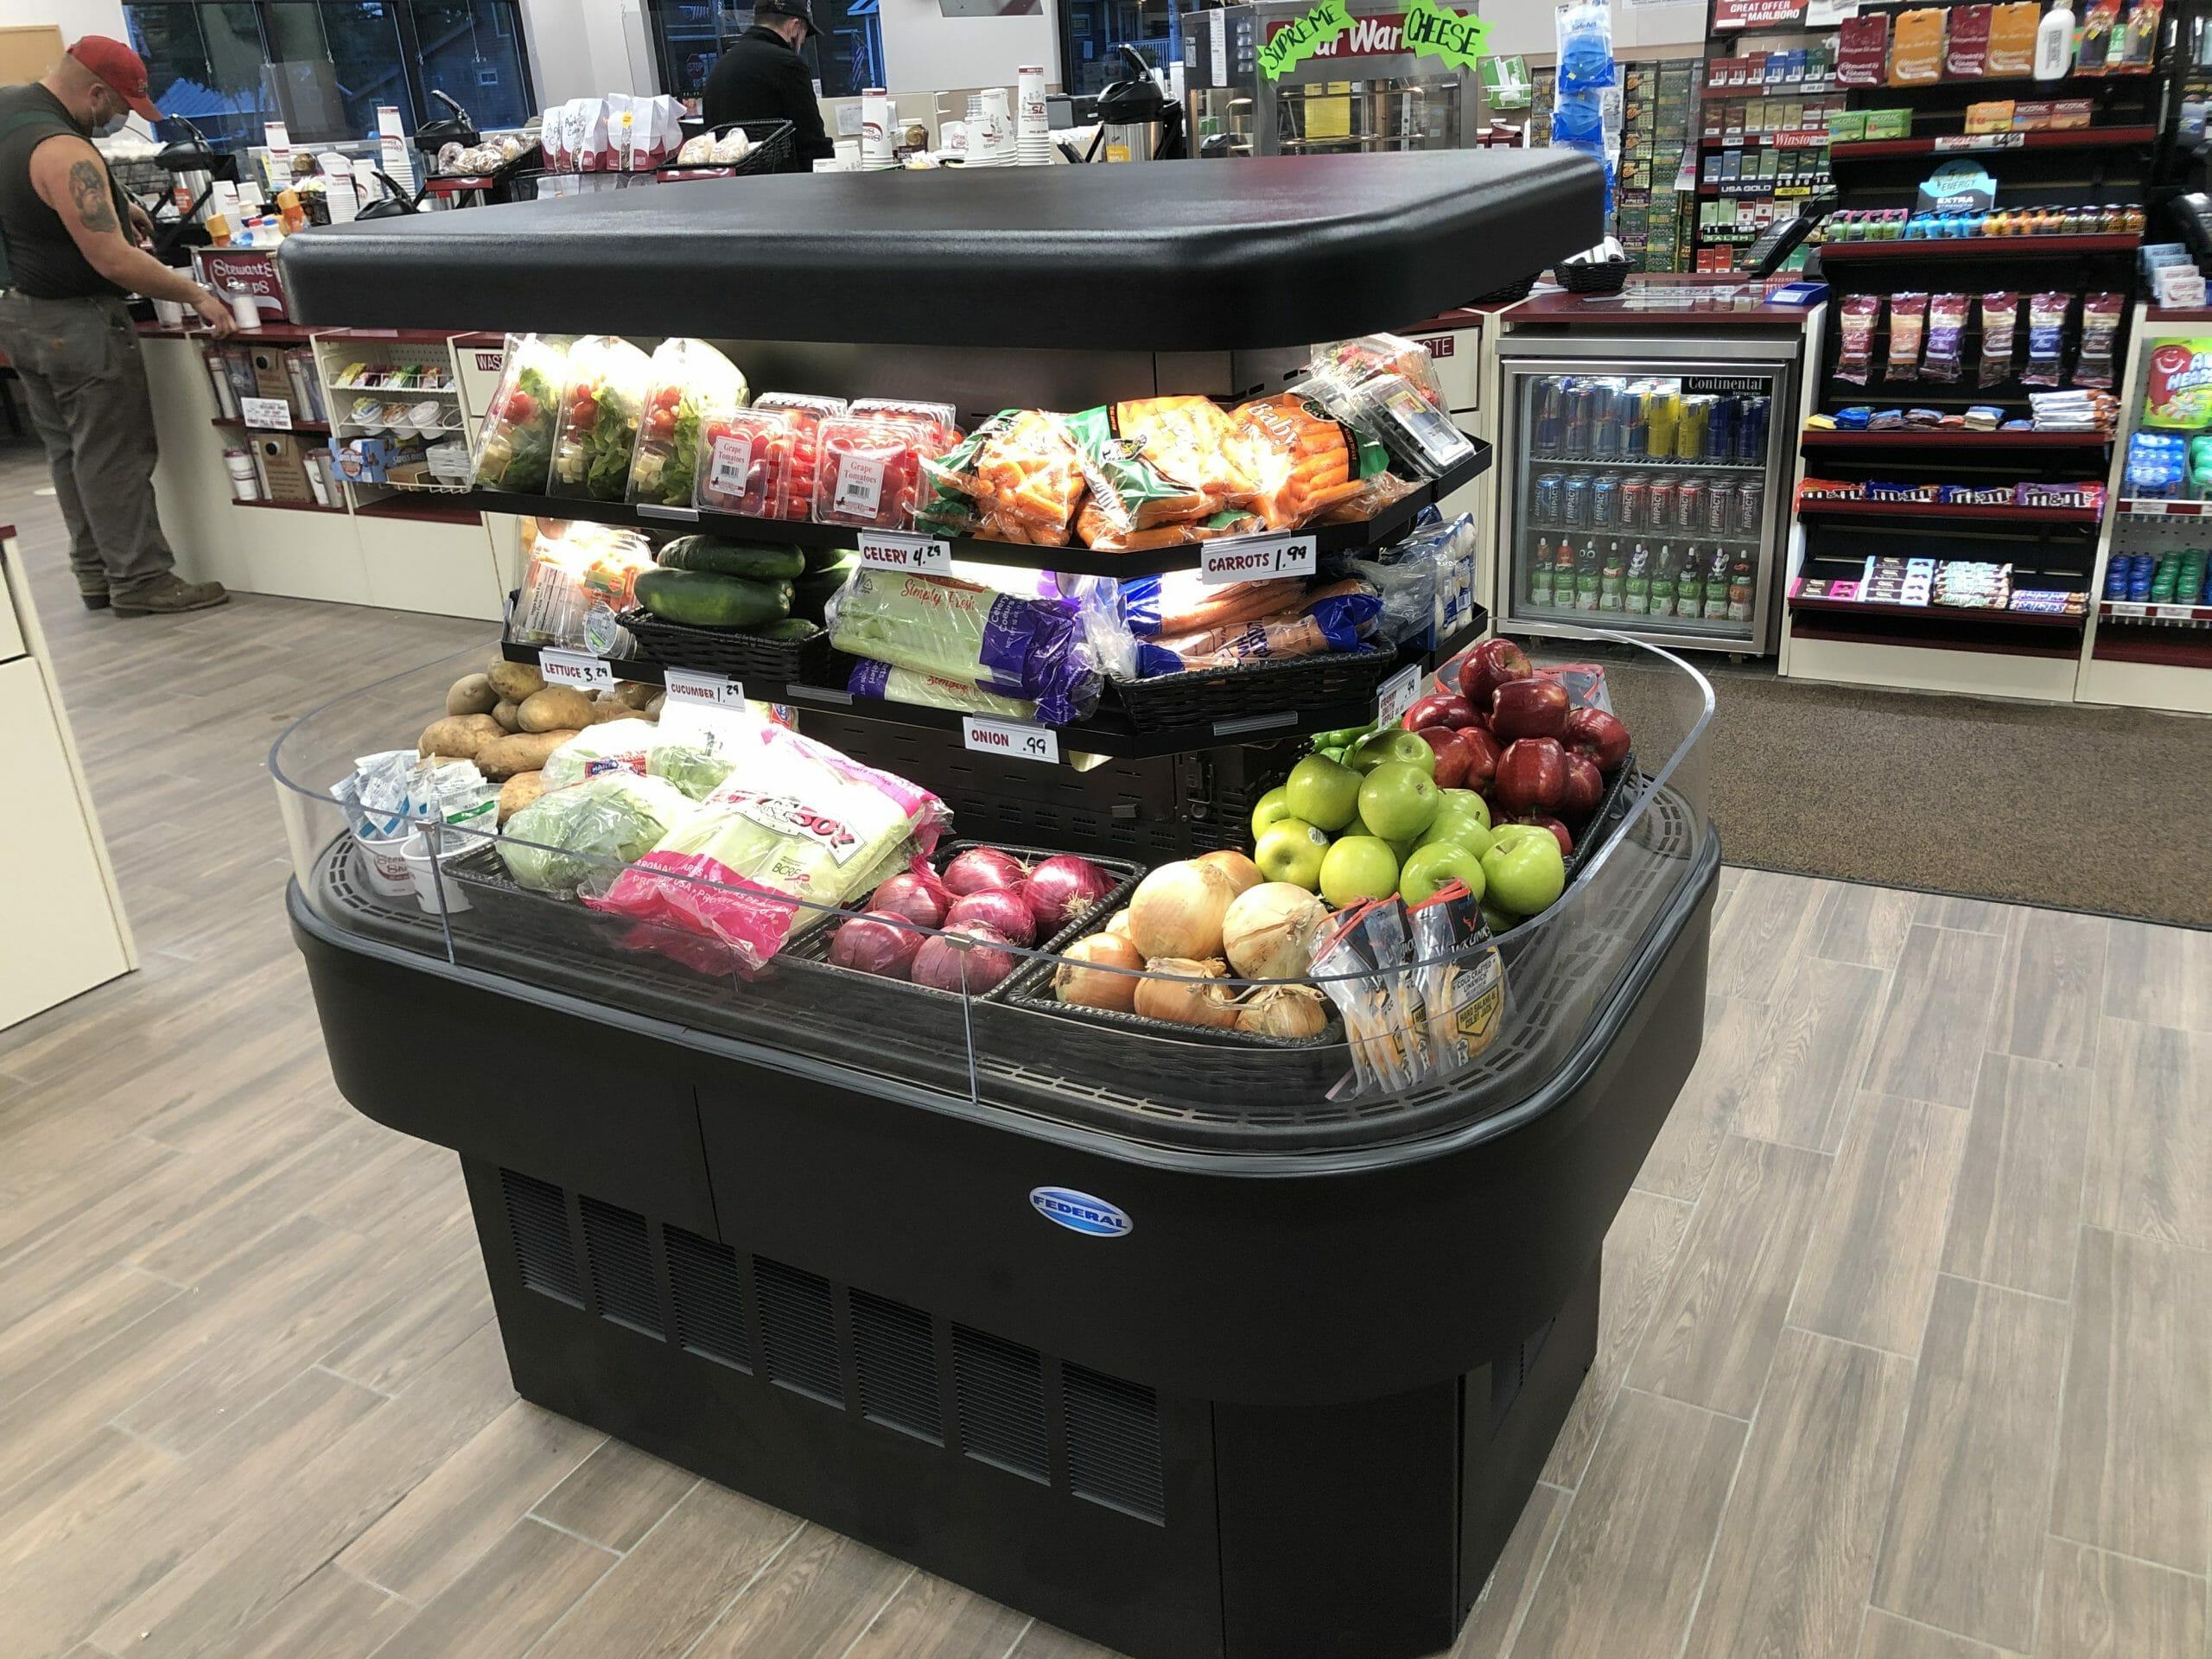 Open refrigerator full or fruit and veggies